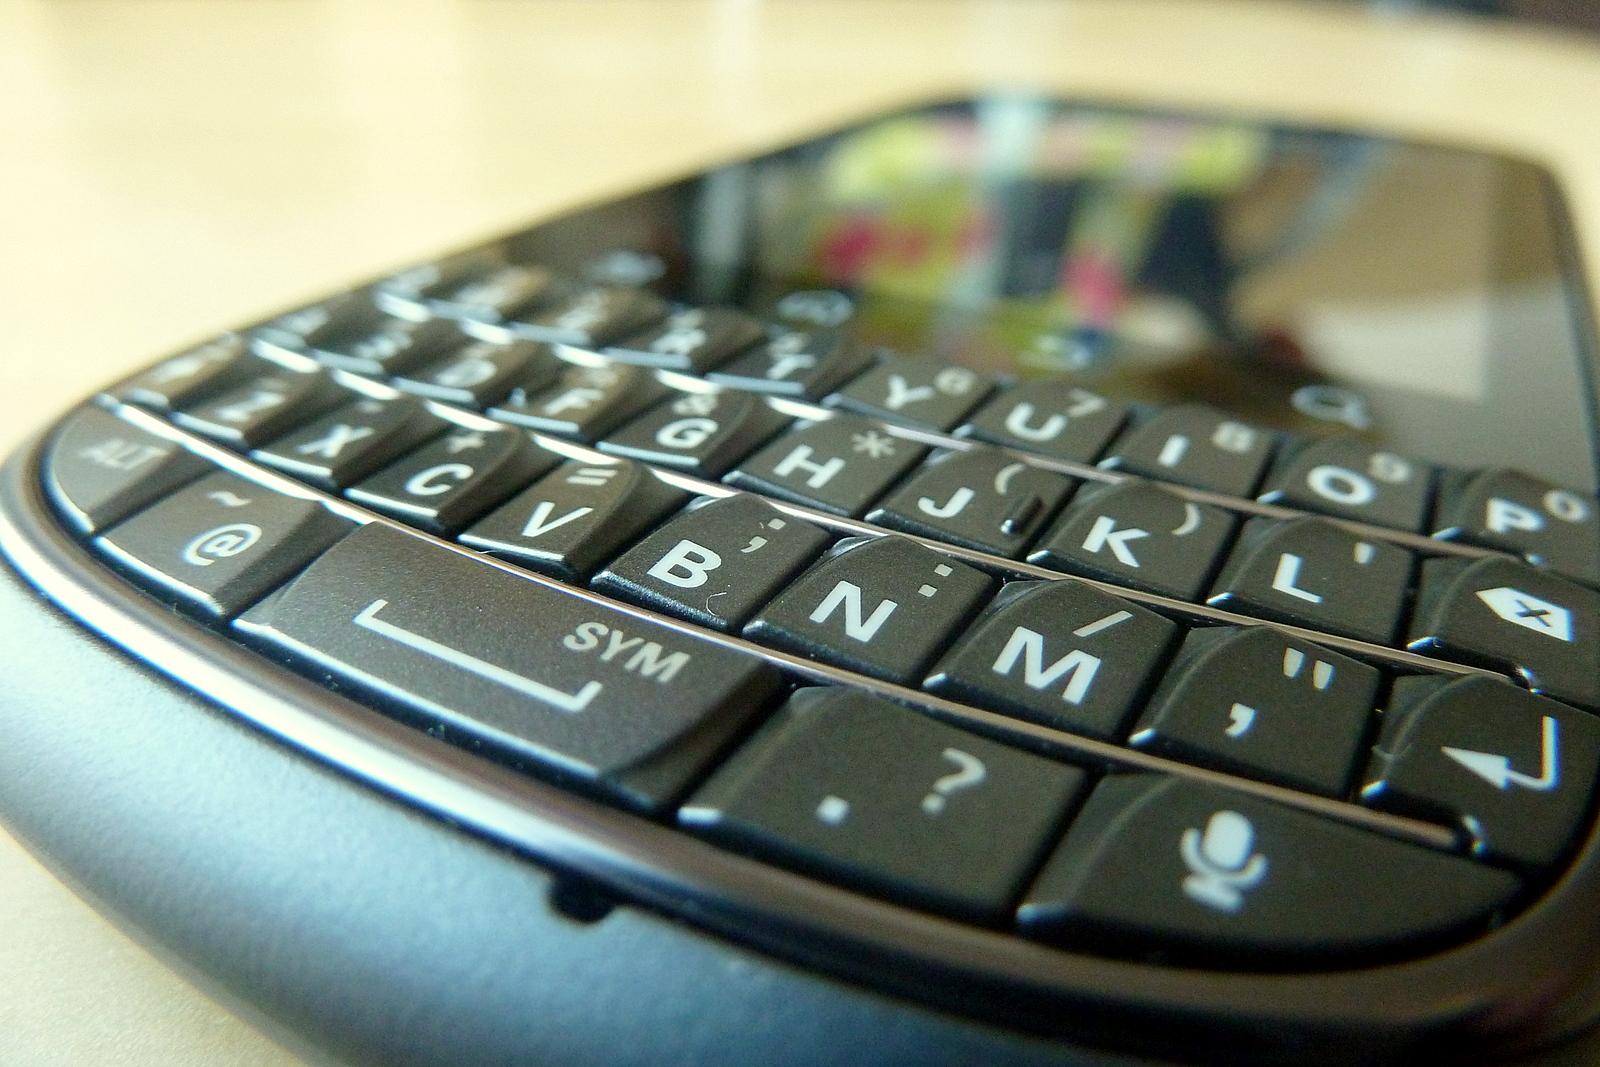 motoproplus keypad angle